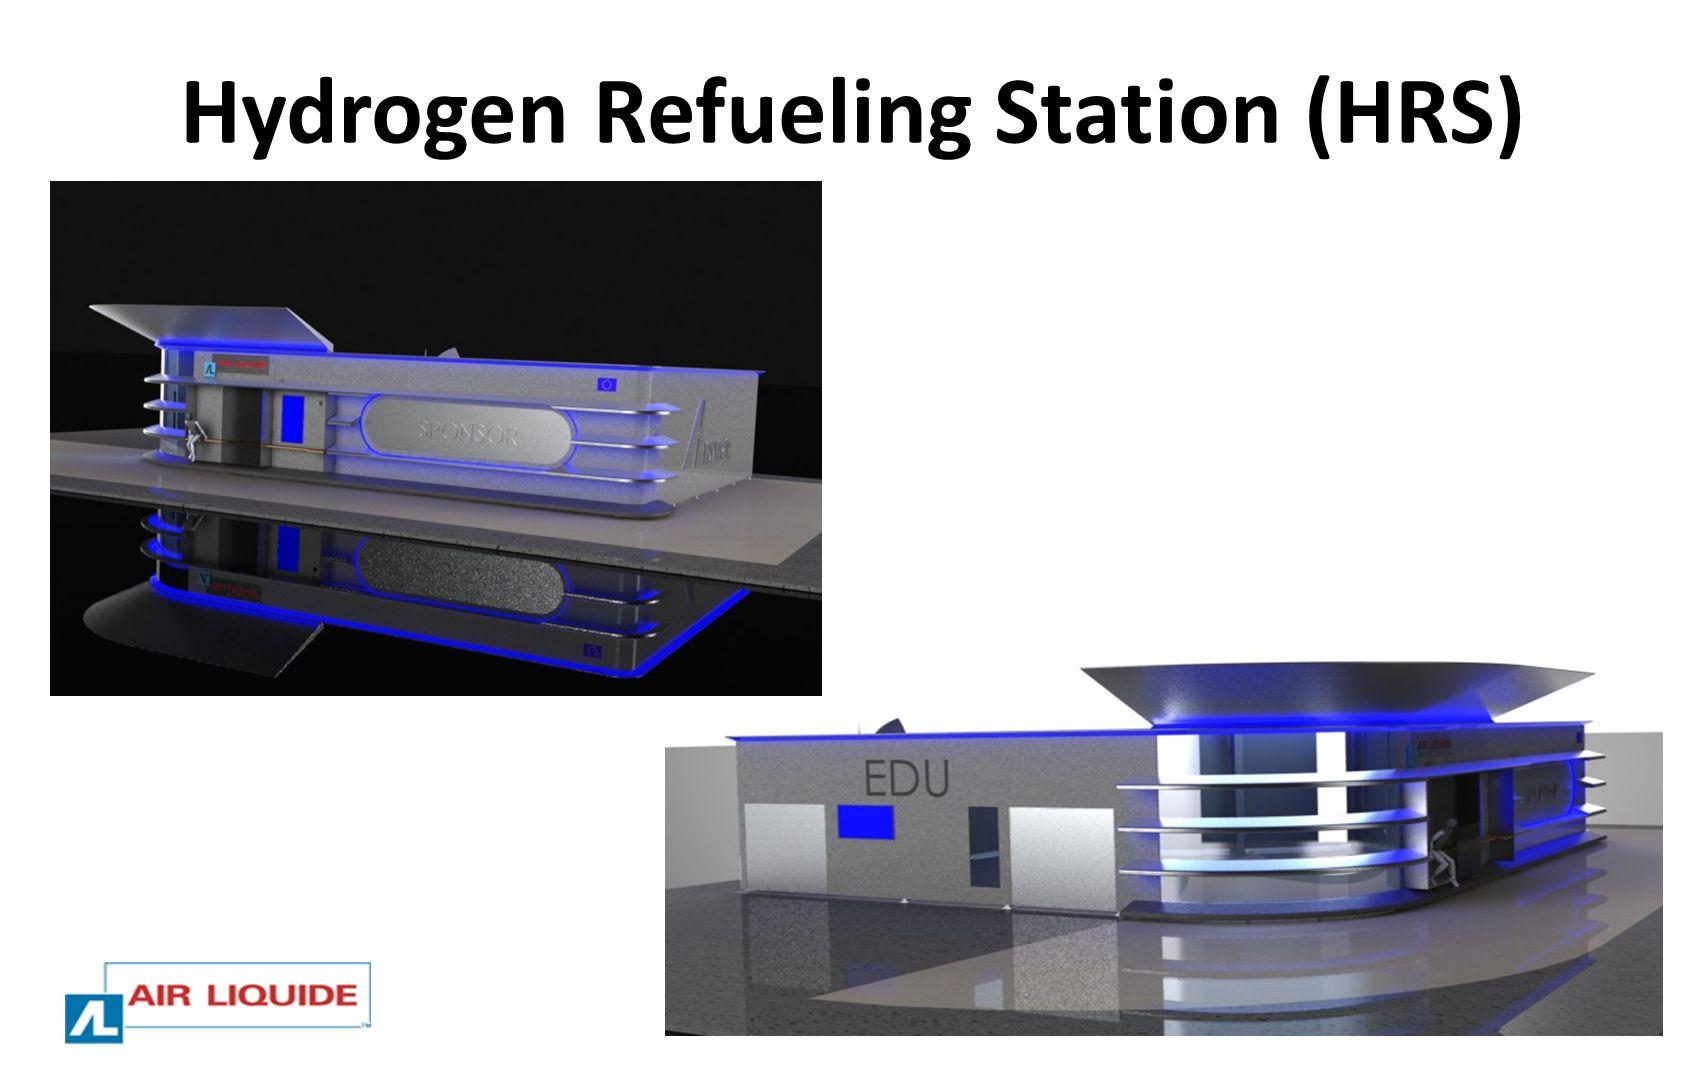 Hydrogen Refueling Station (HRS)